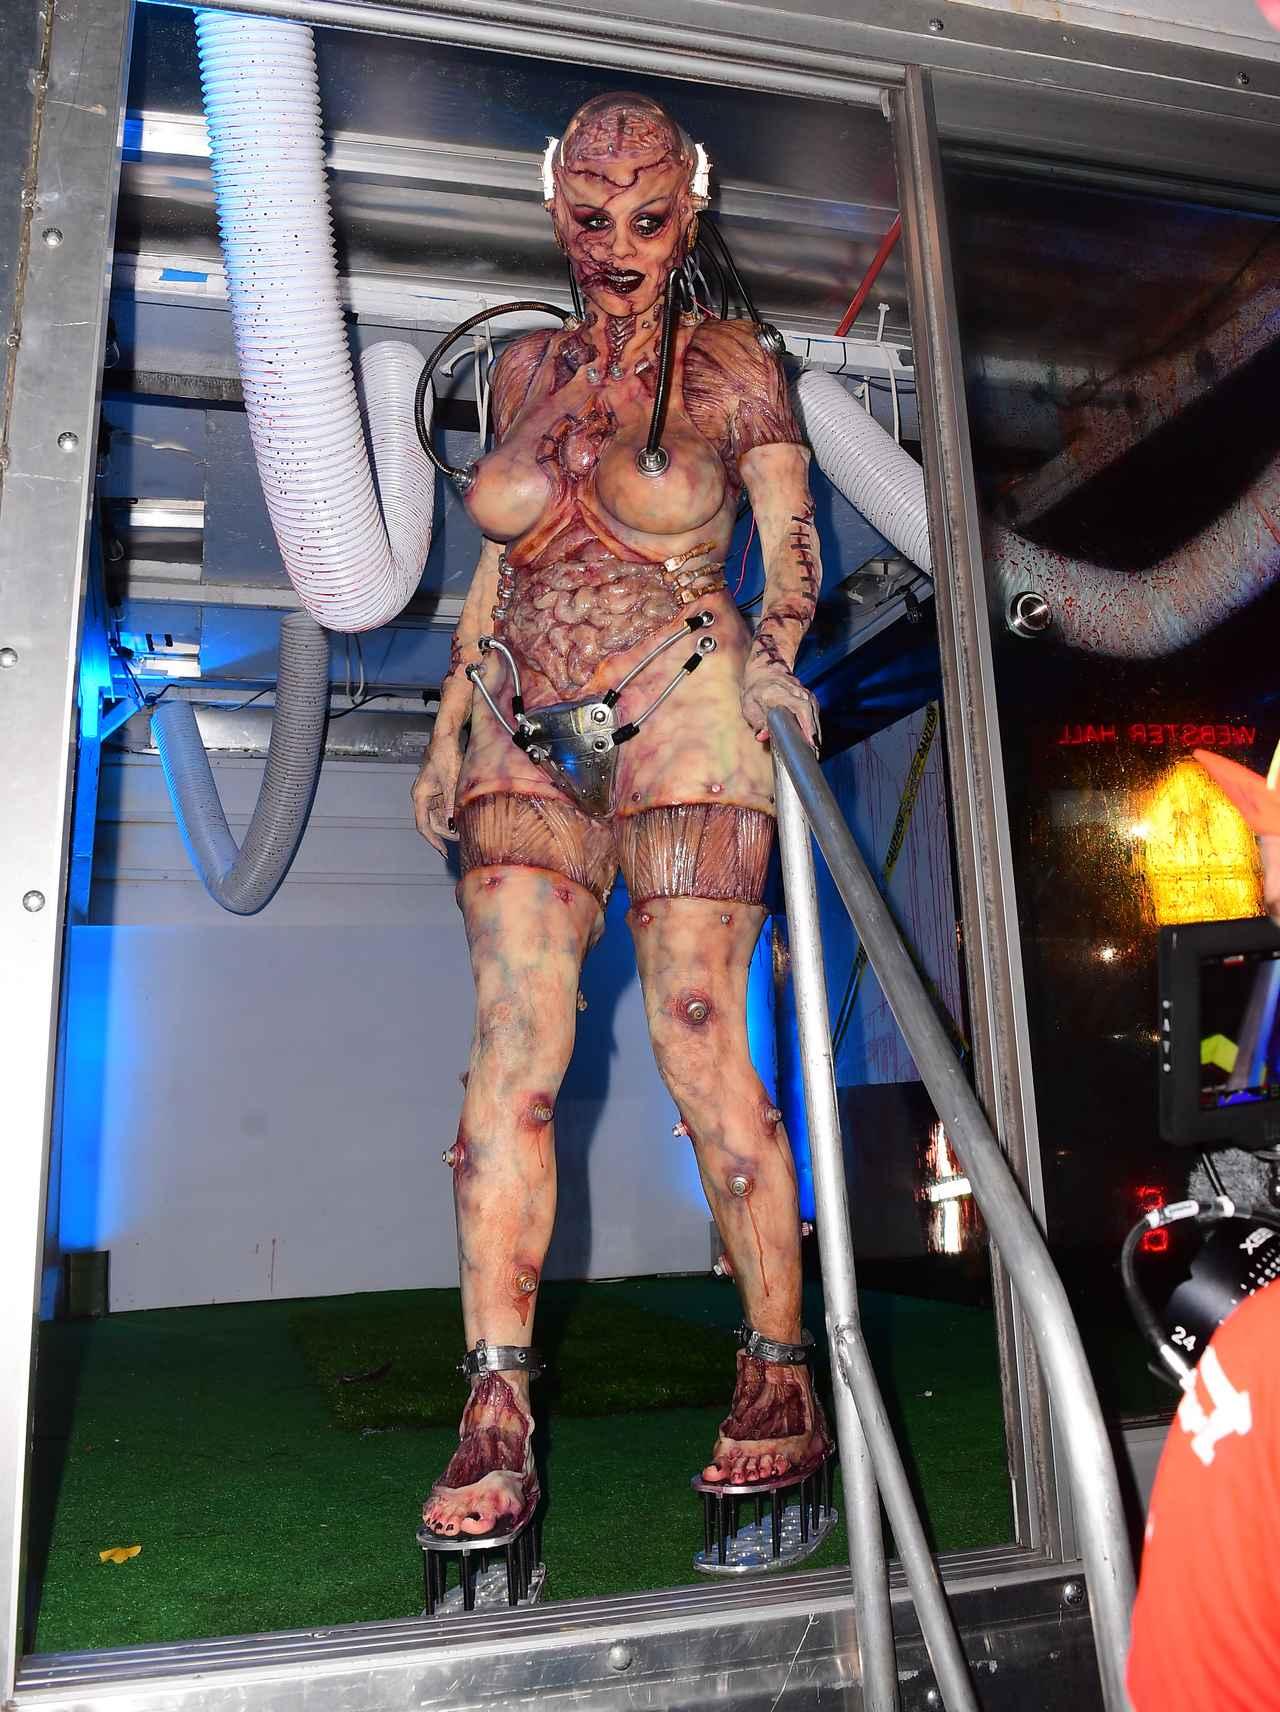 Images : 16番目の画像 - 「ハロウィンの女王」ハイディ・クルムの仮装が怖すぎる - フロントロウ -海外セレブ情報を発信